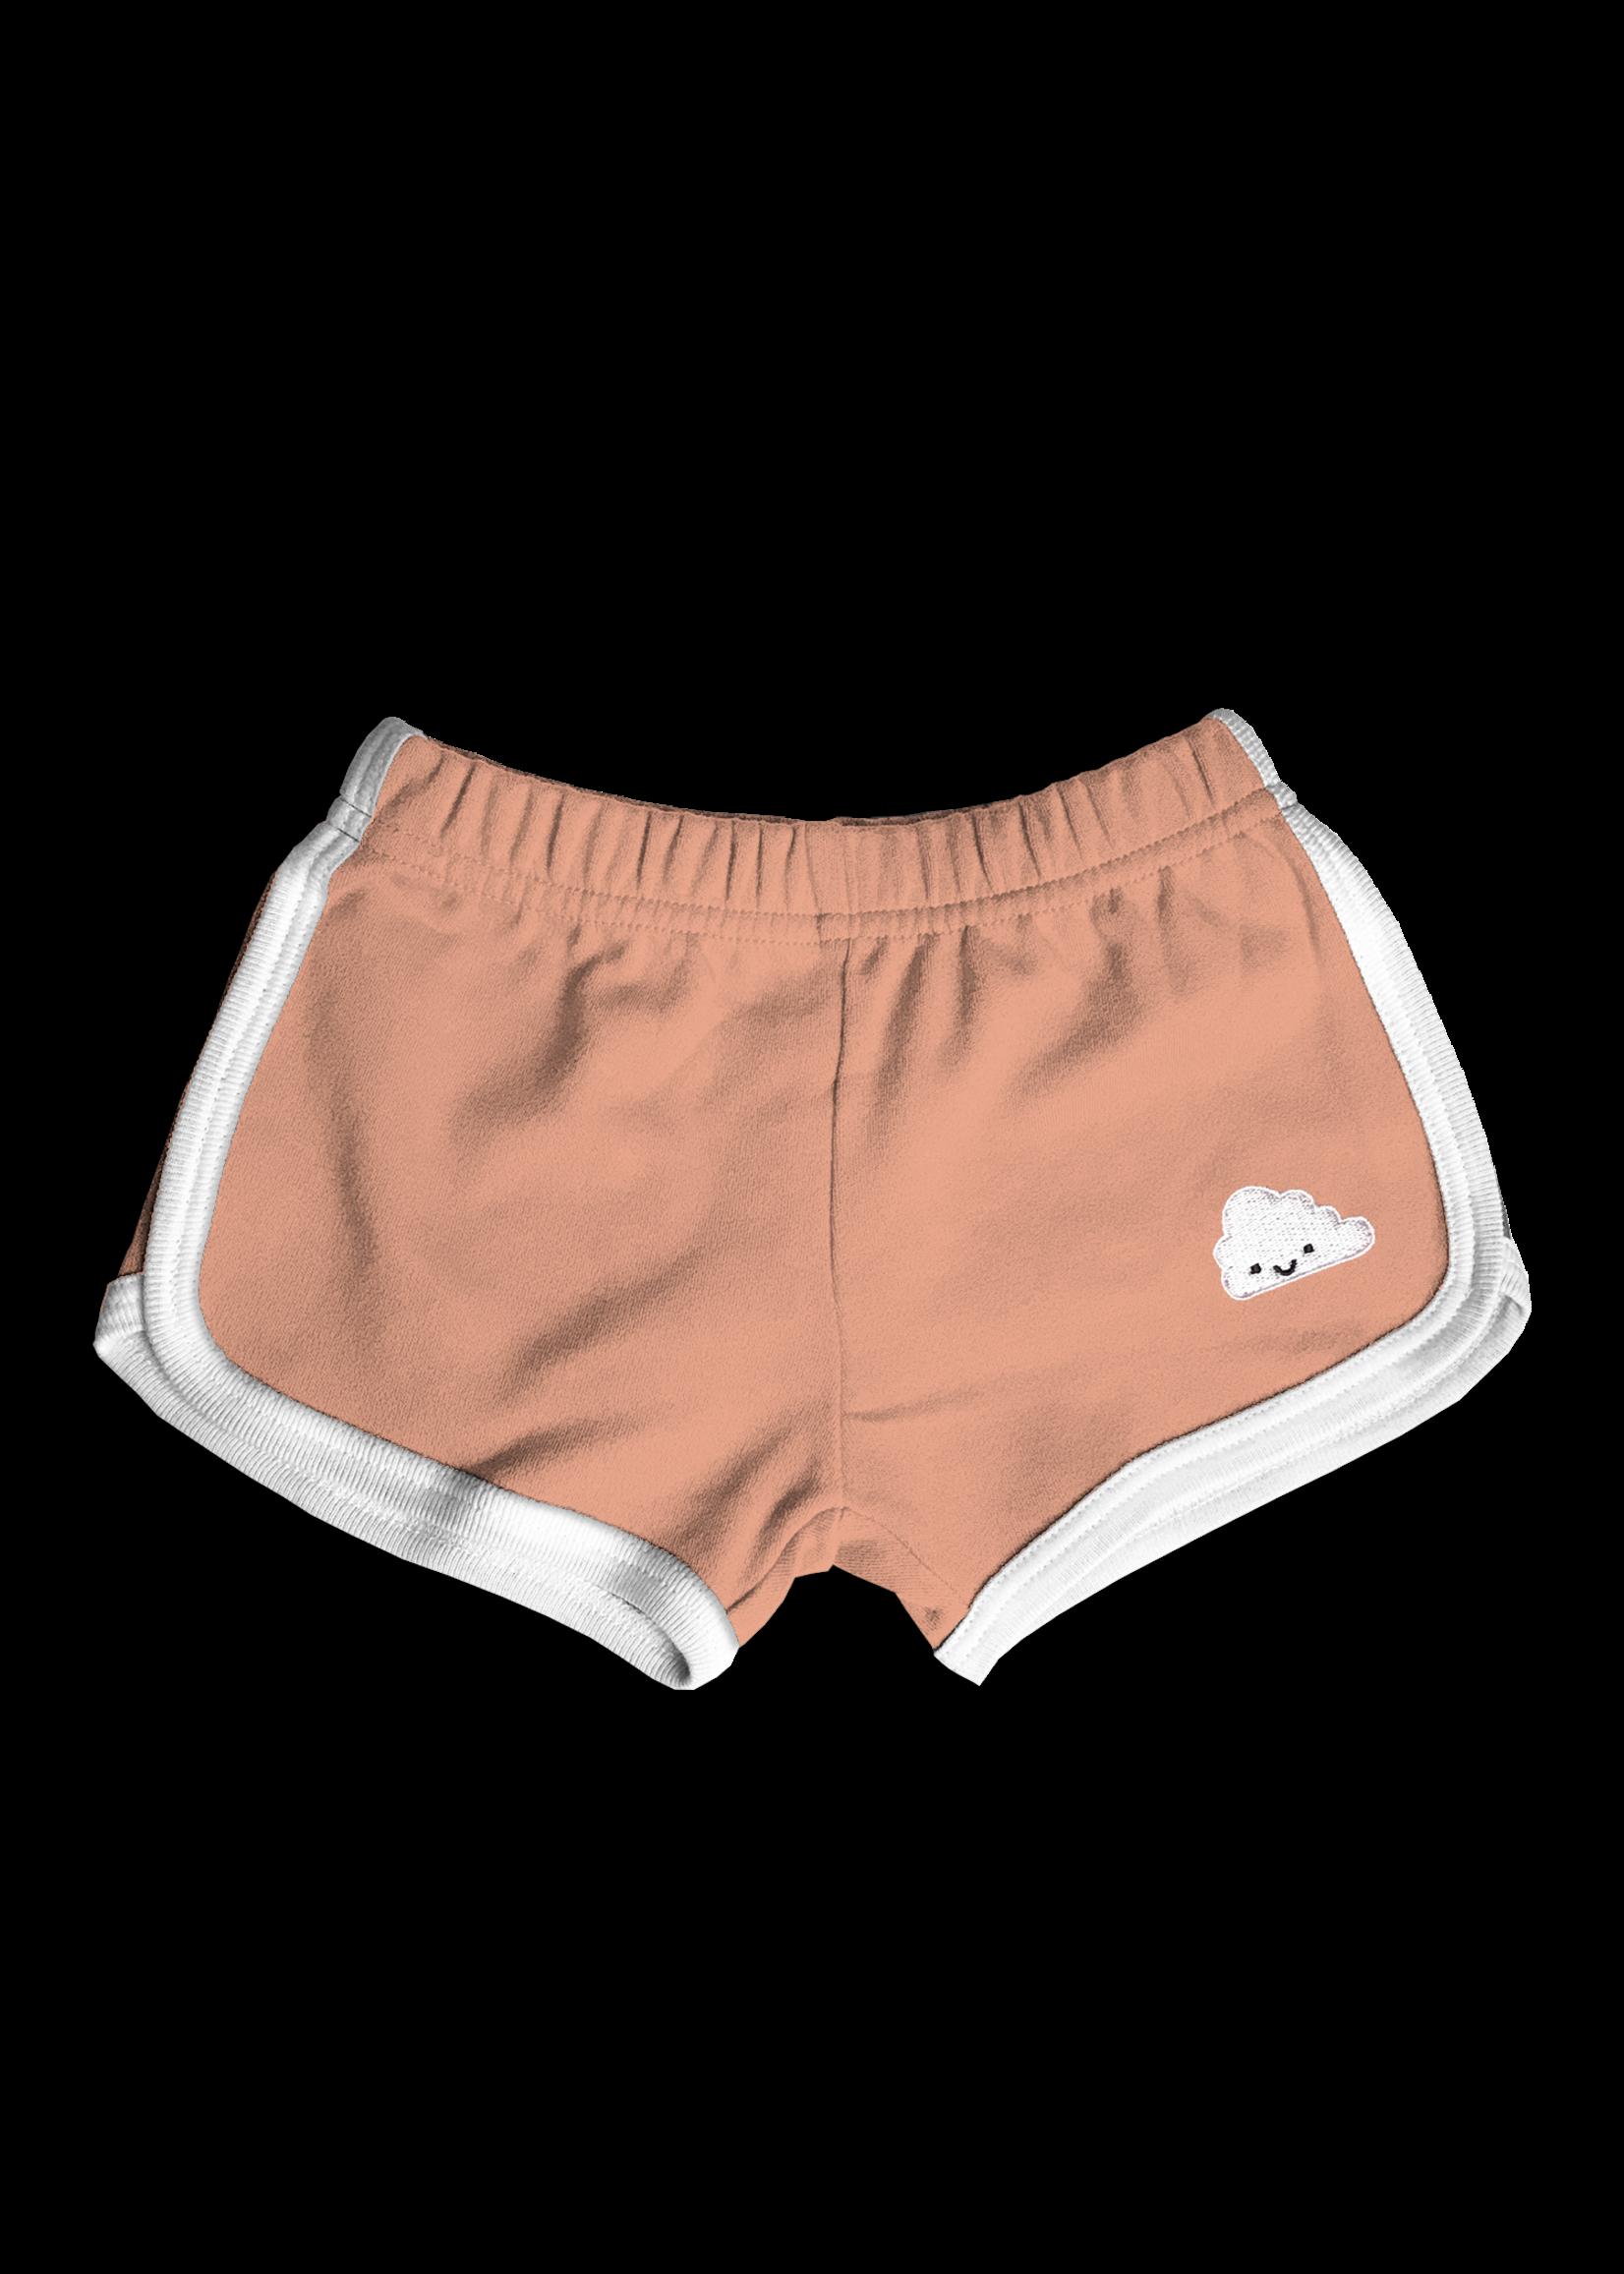 Whistle & Flute Whistle & Flute Running Shorts (Peach)